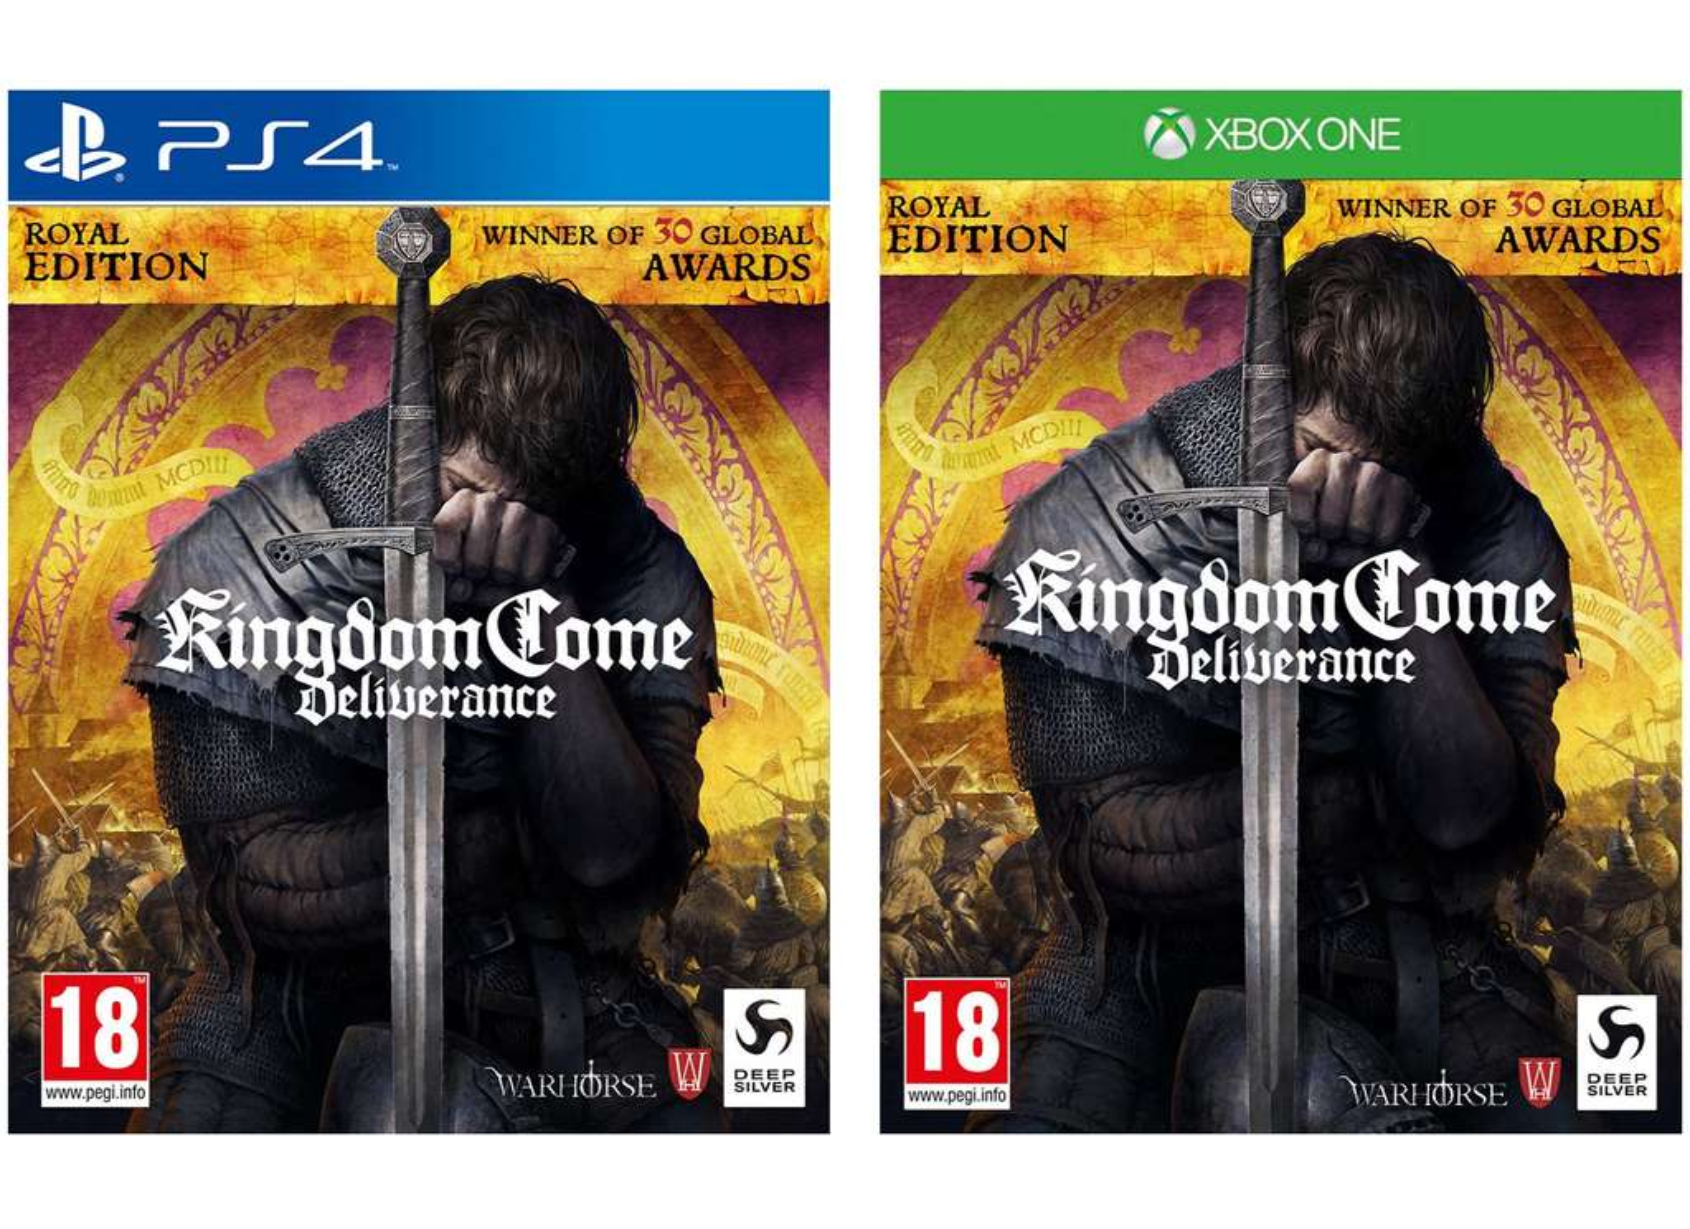 Kingdom Come: Deliverance - Royal Edition (PS4 / Xbox One) for